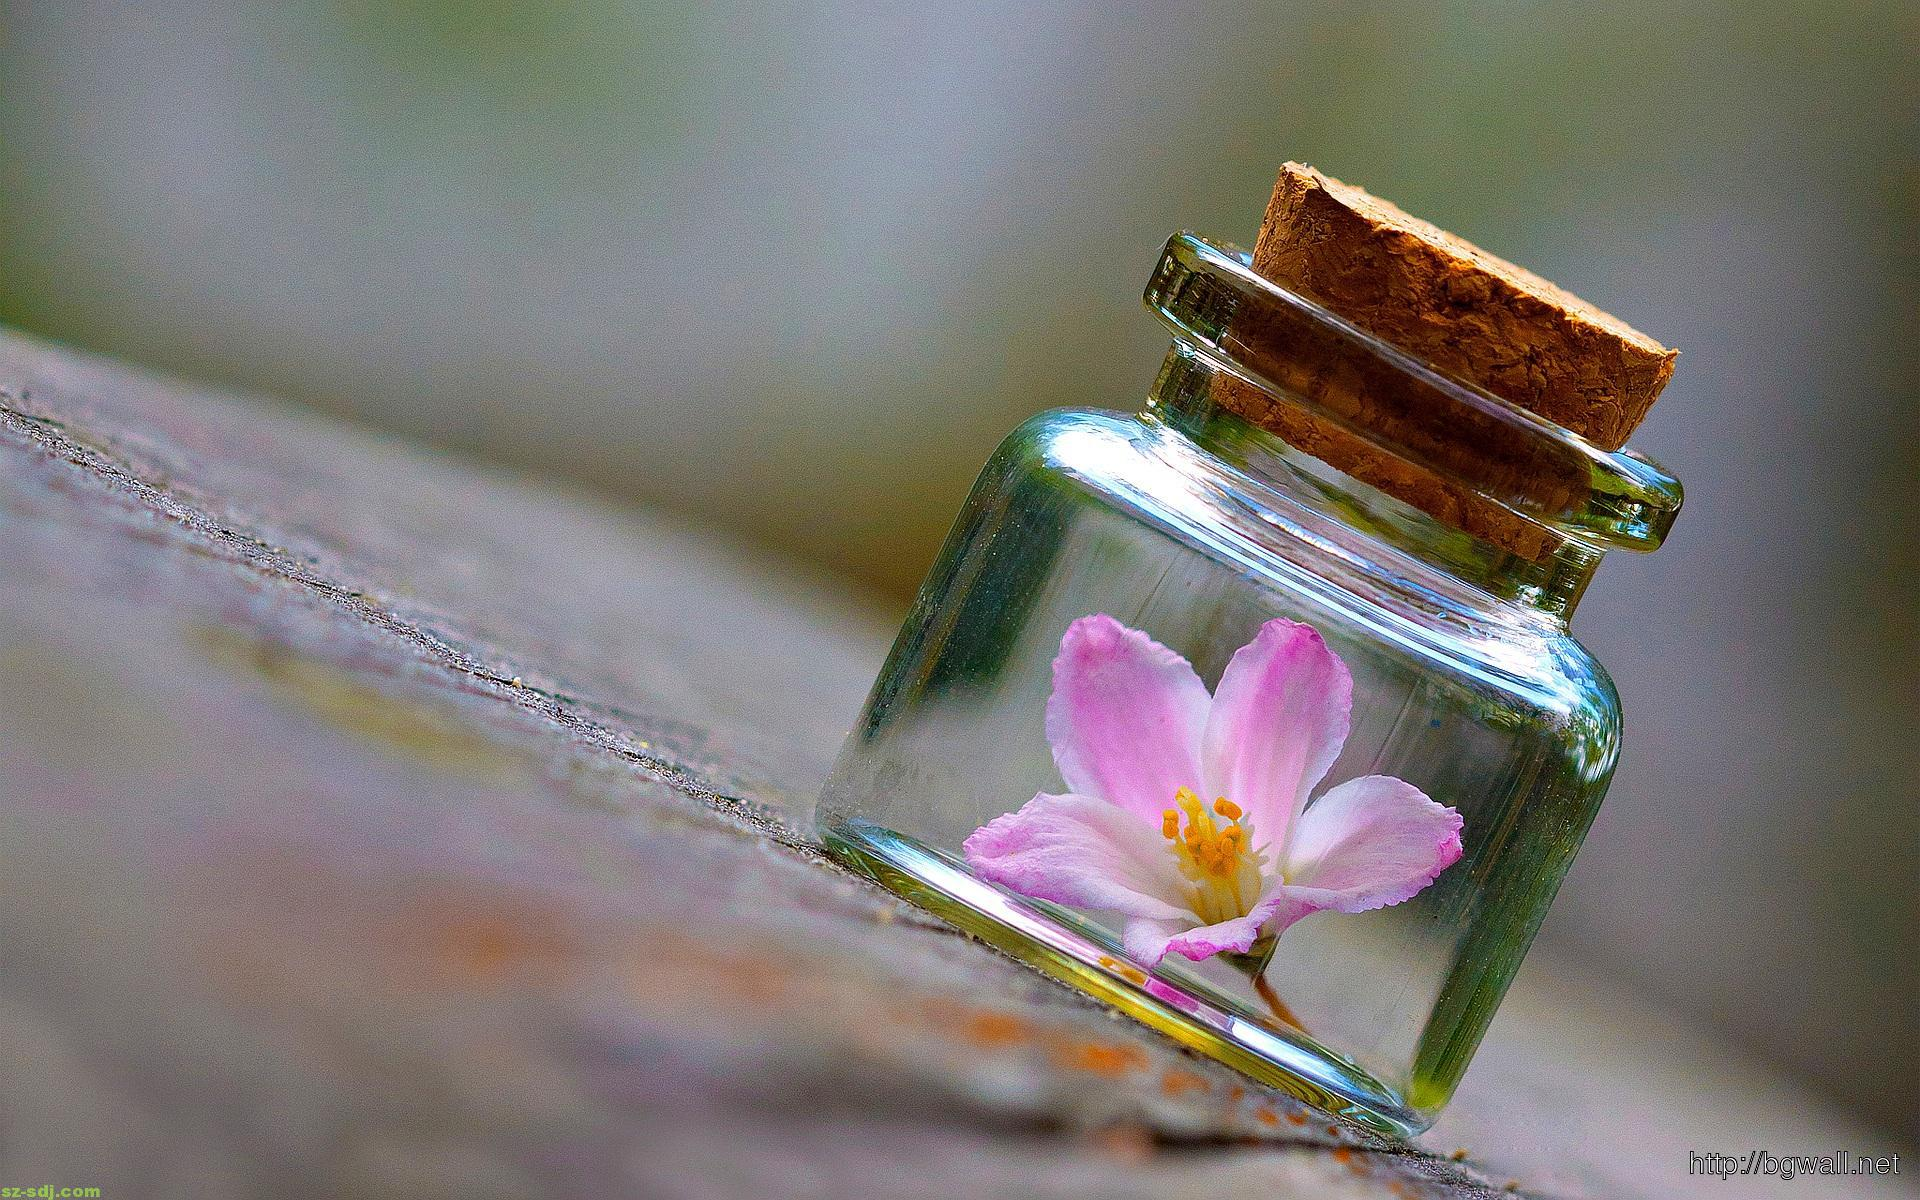 Flower-on-the-Bottle-Wallpaper-Android